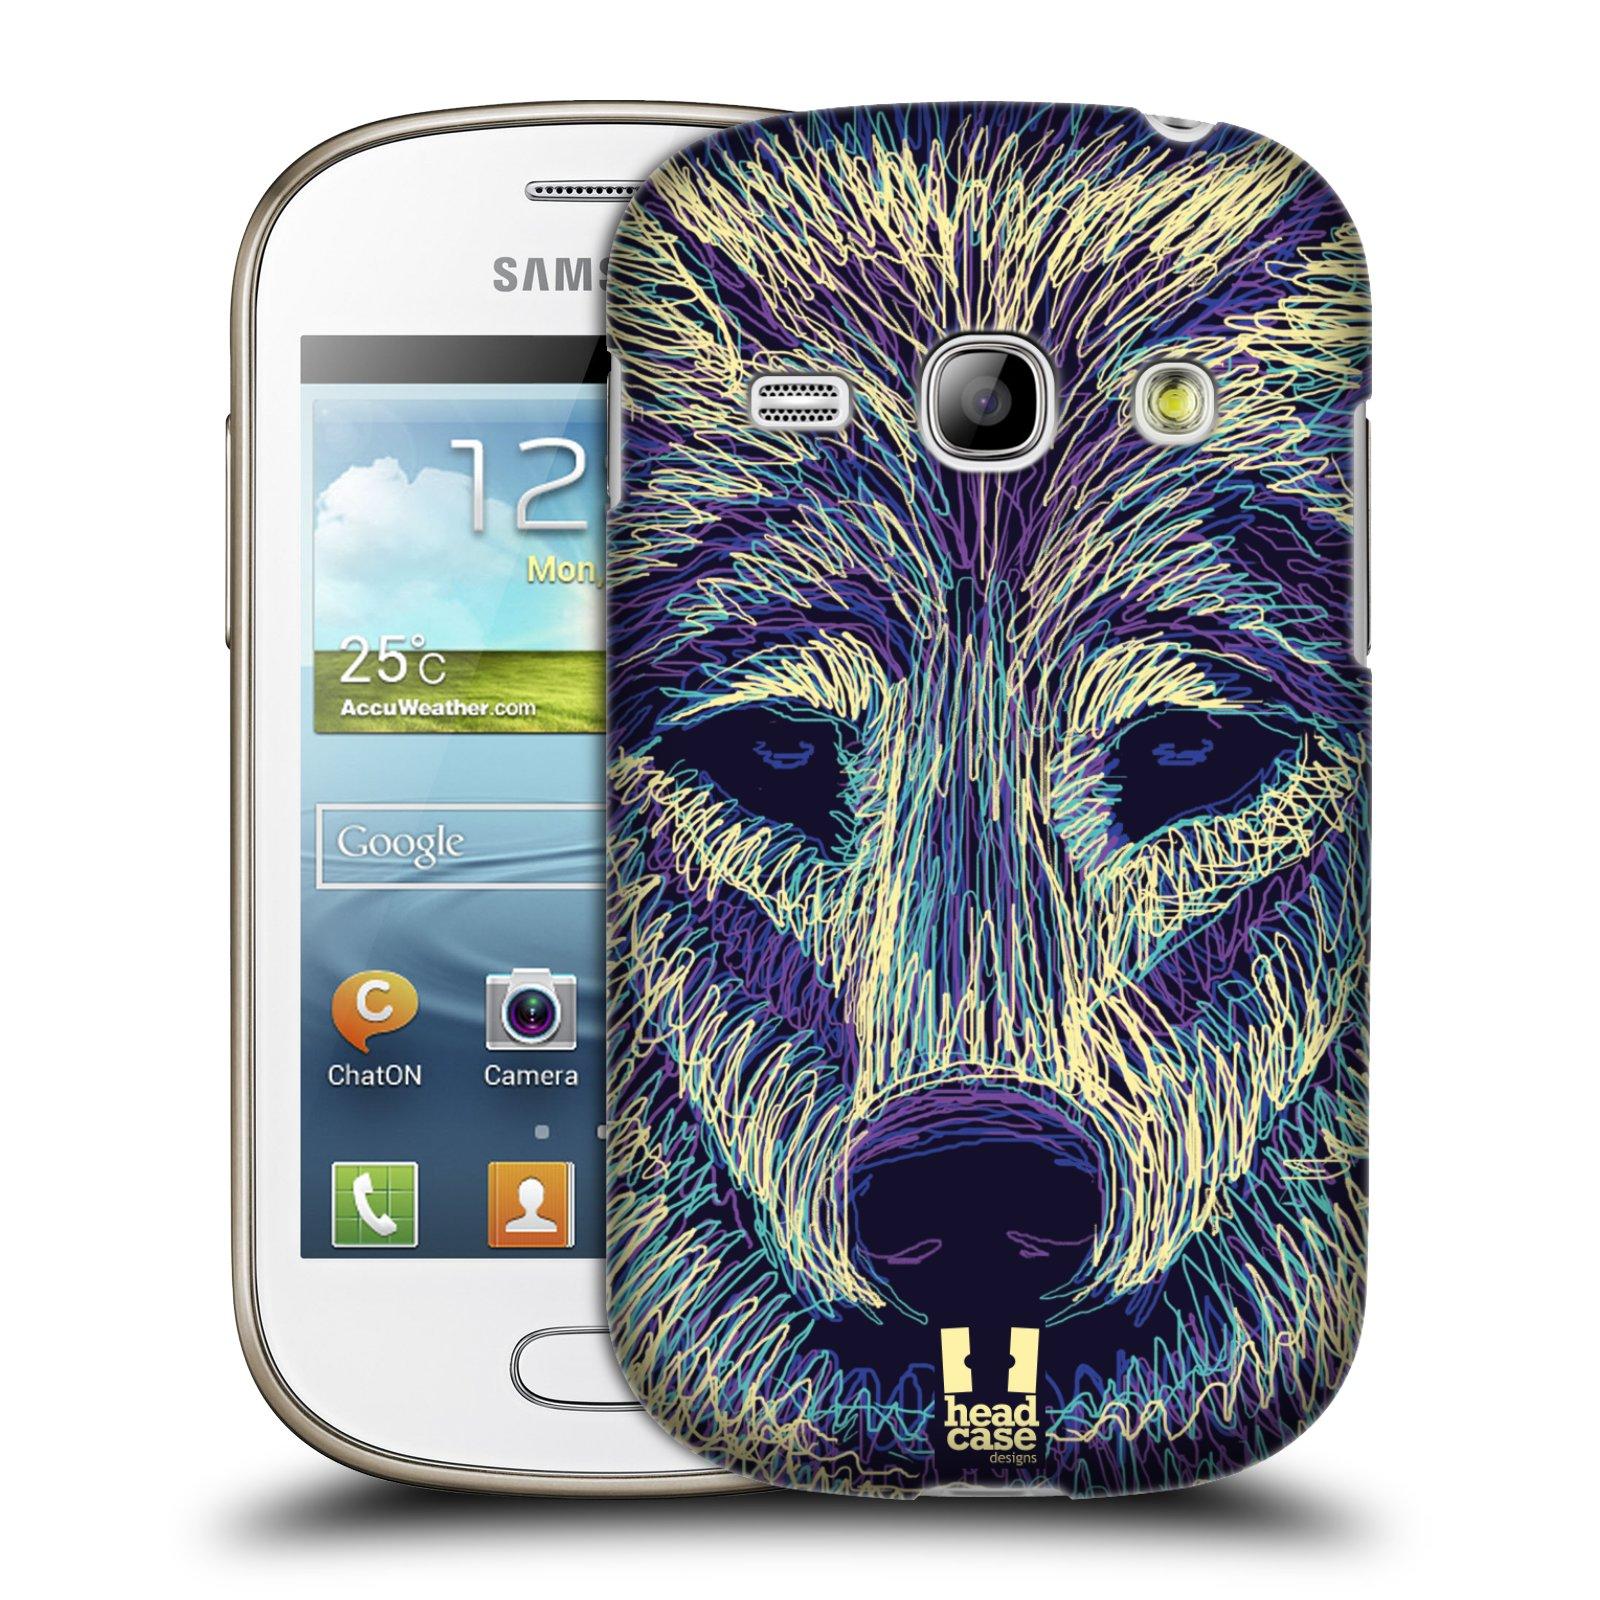 HEAD CASE plastový obal na mobil SAMSUNG GALAXY FAME (S6810) vzor zvíře čmáranice vlk